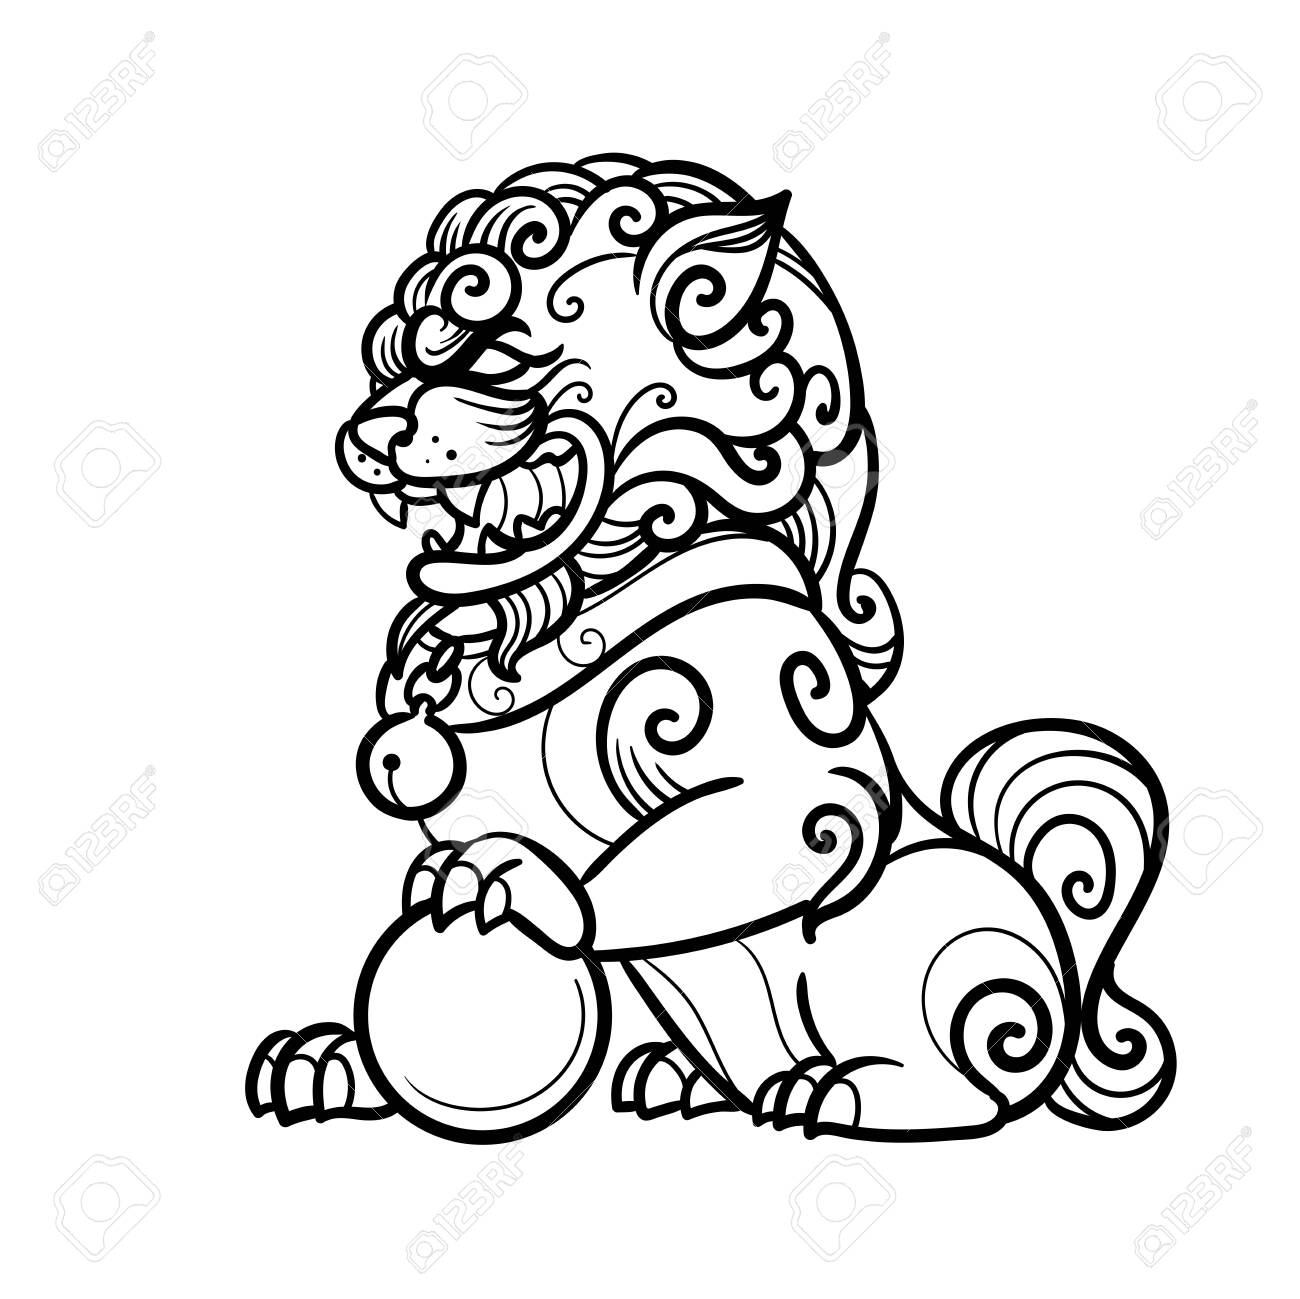 Traditional buddhist guardian lion. Vector hand drawn illustration - 148405625